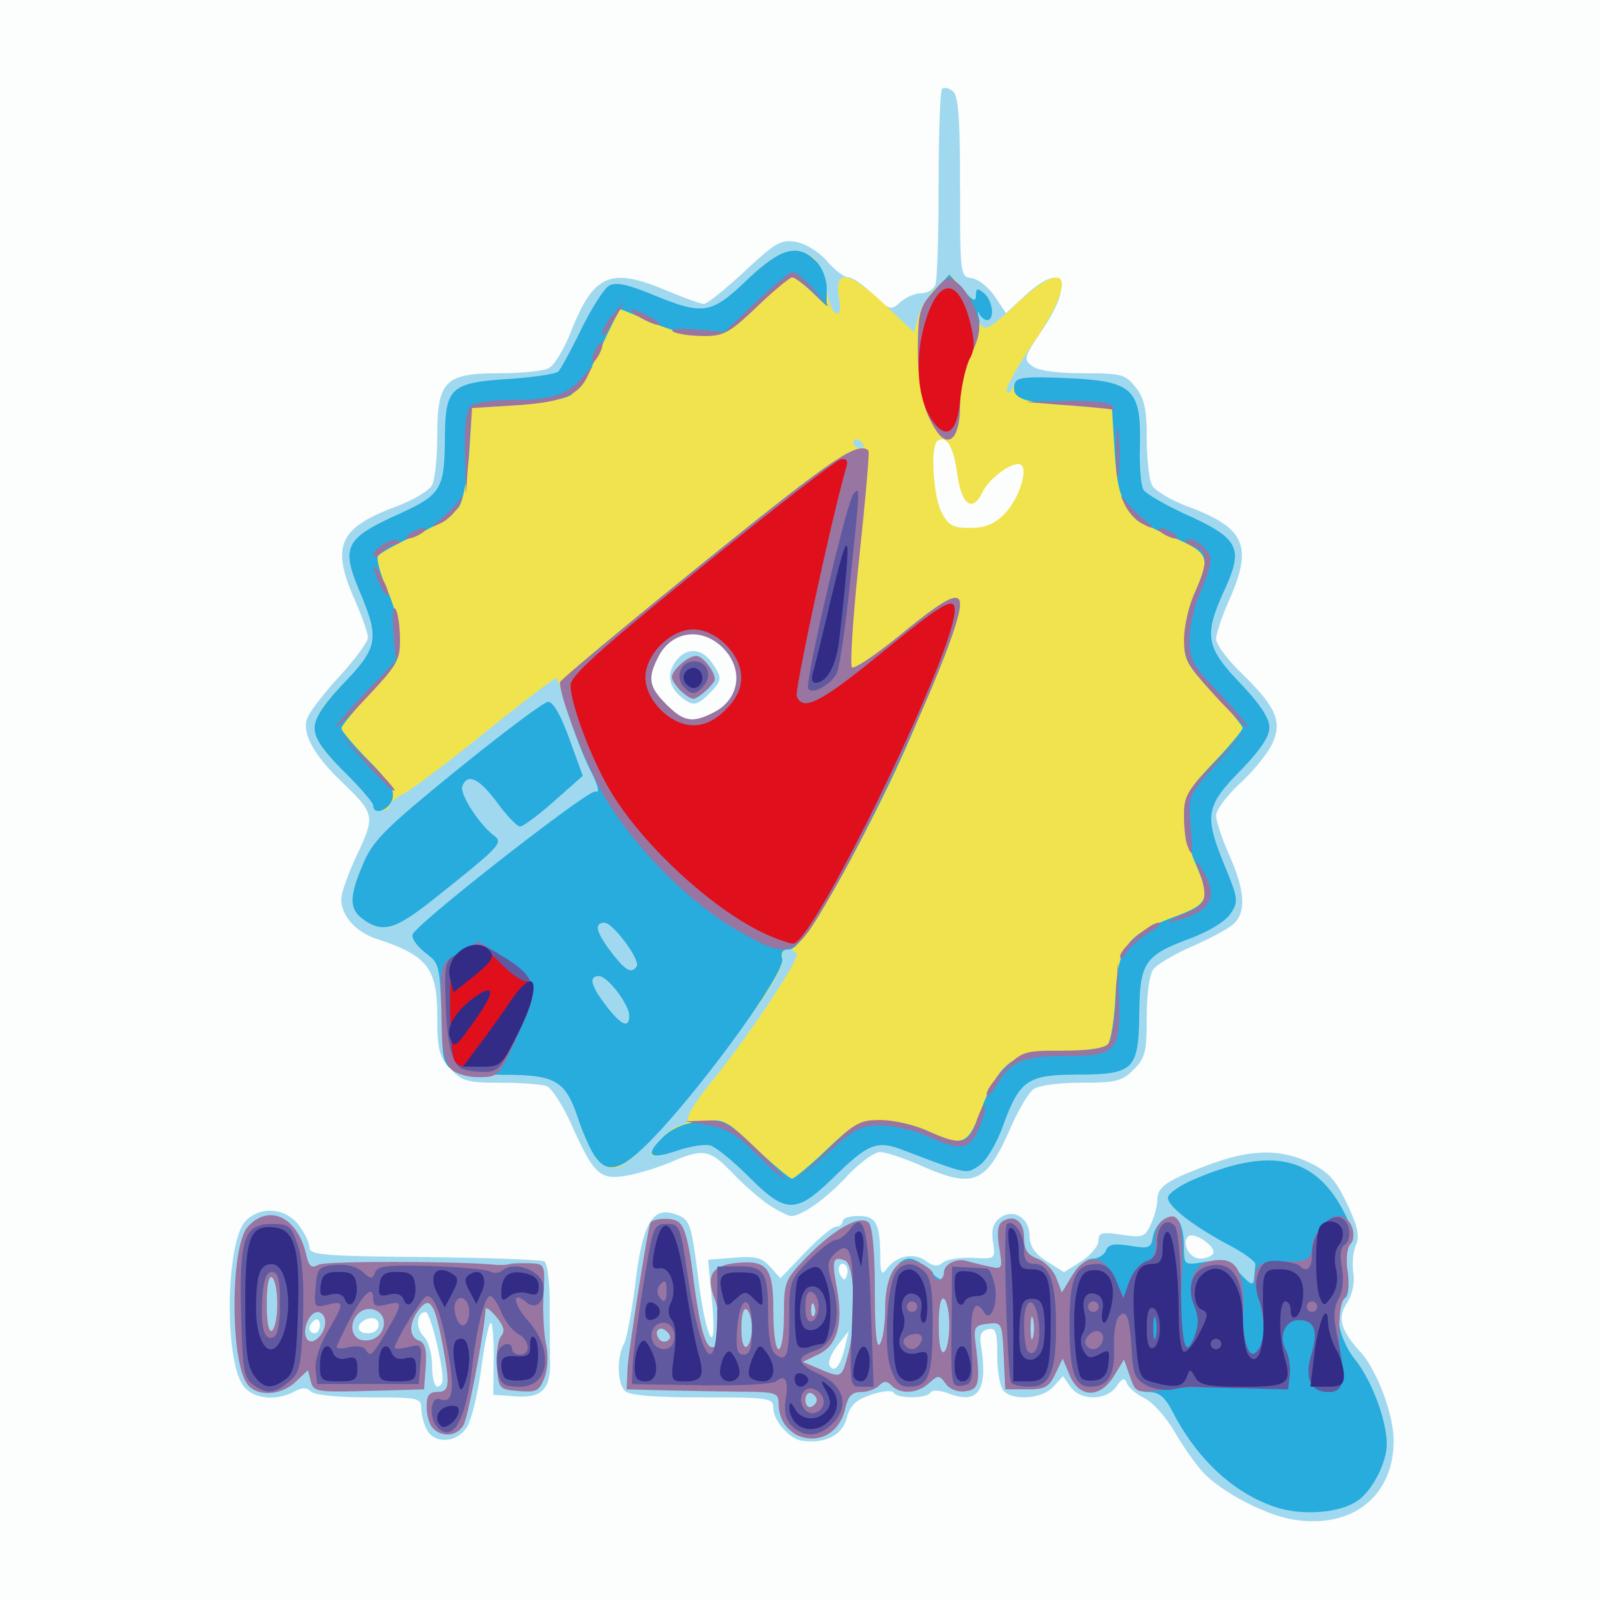 Logo Ozzys Anglerbedarf - Inkscape | BANNERKÖNIG